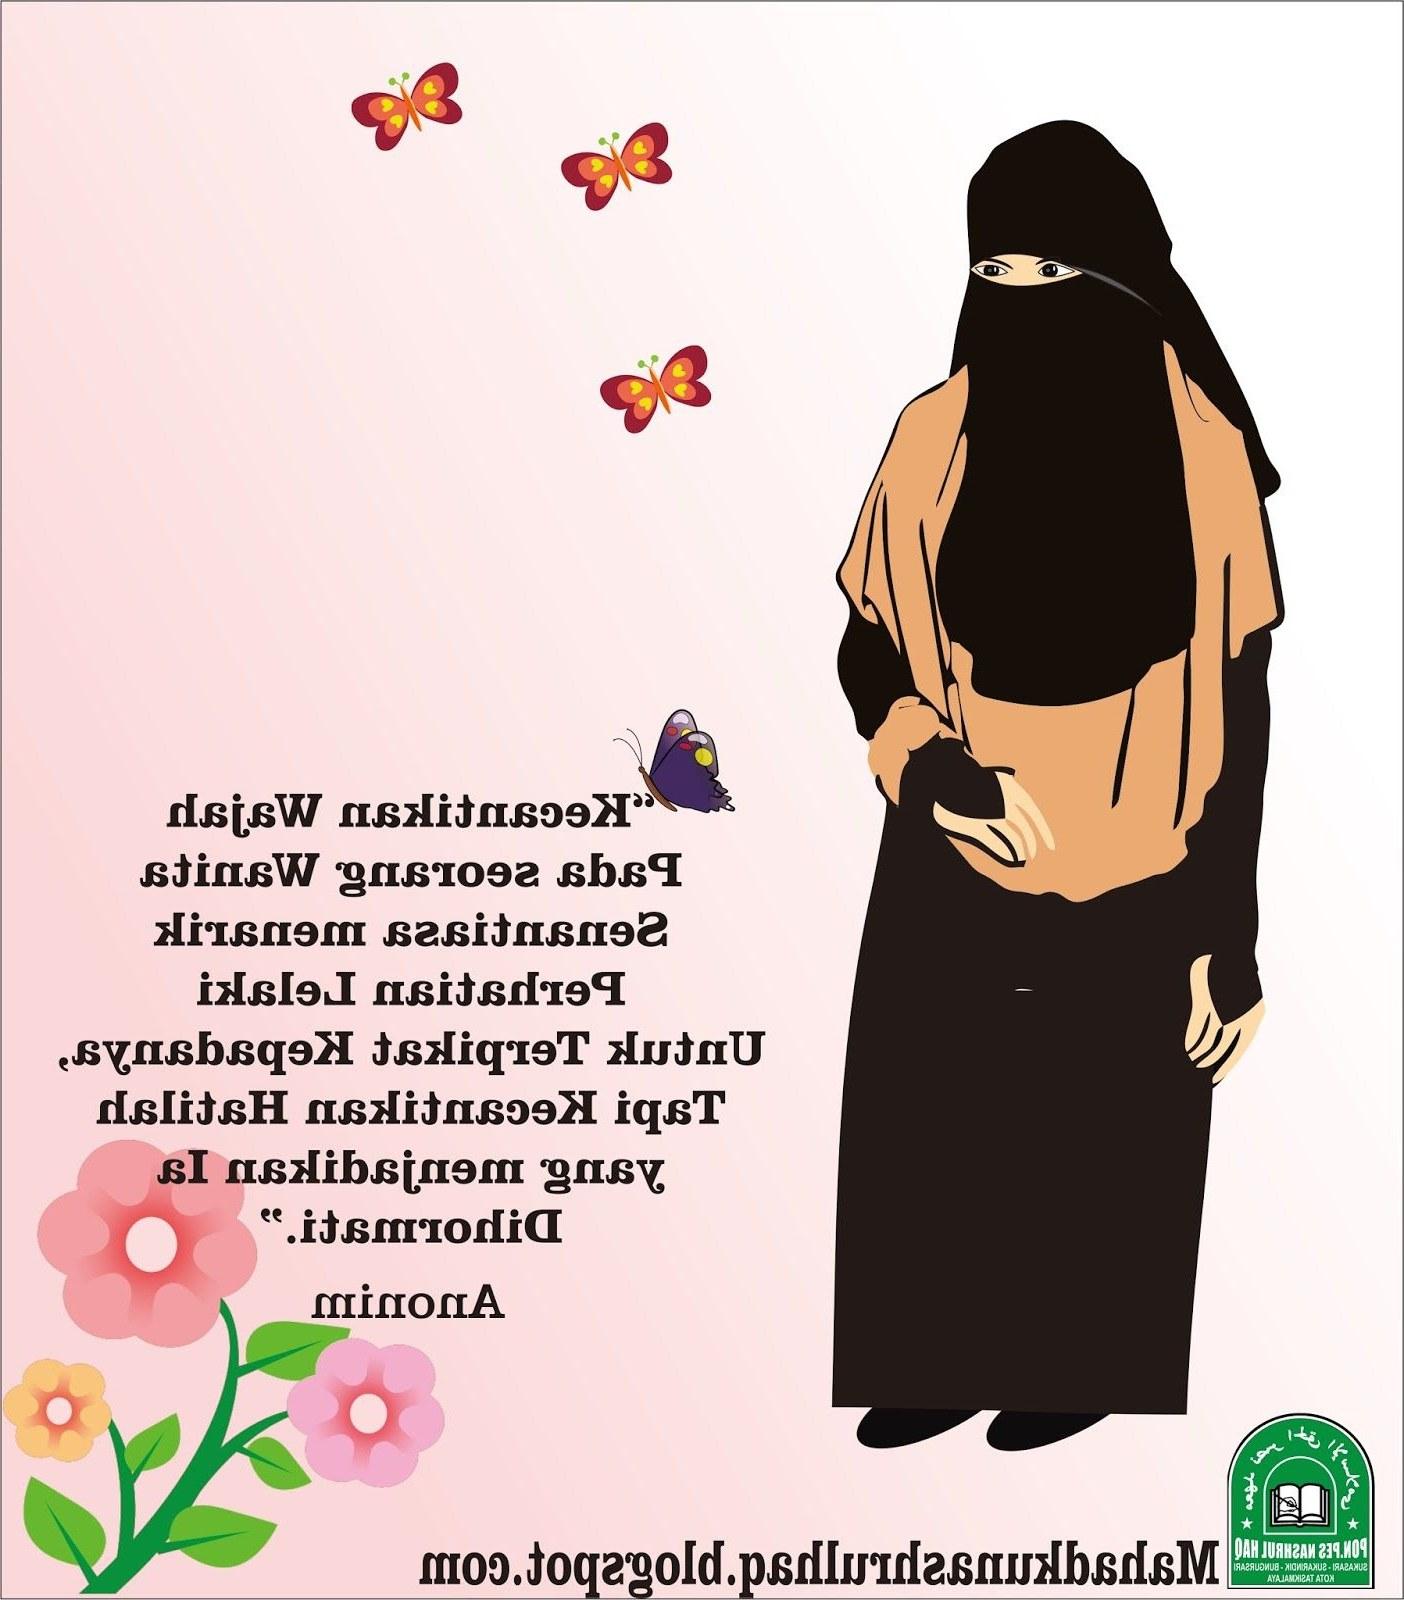 Model Muslimah Bercadar Animasi Tldn Gambar Kartun Muslimah Bercadar Tentang Kecantikan Hati